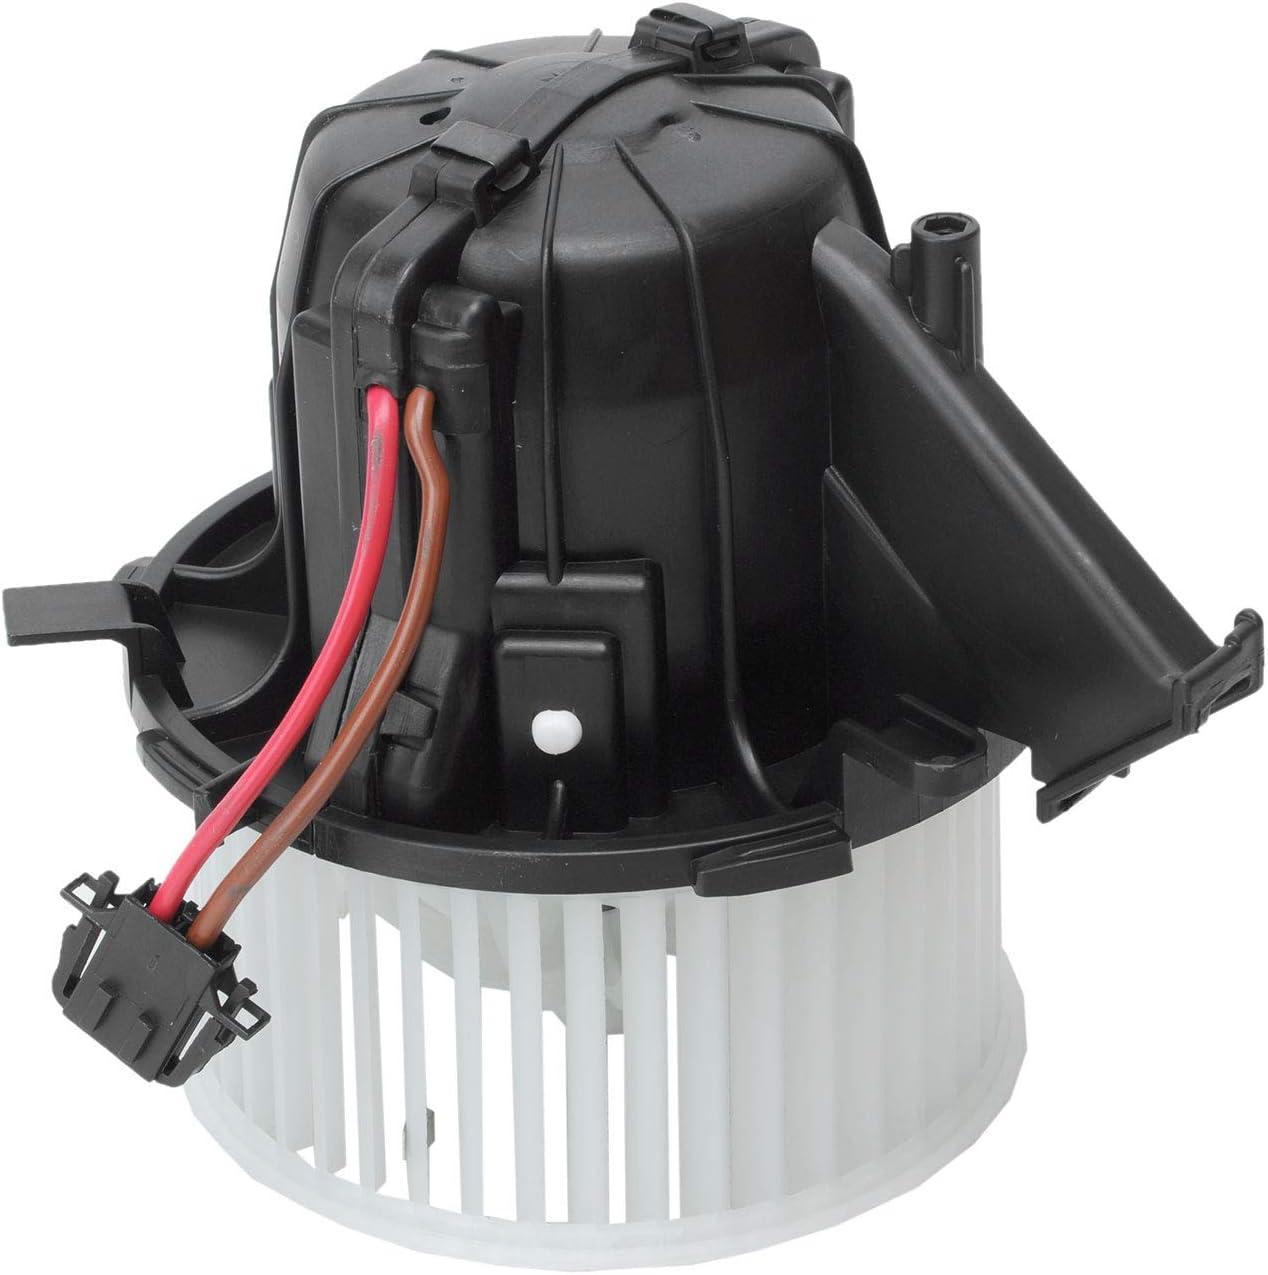 A//C Heater Blower Motor Fan Assembly for 08-12 Au-di A4 S4 Q5 A5 S5 Part# 8K1820021C 8K1820021B NEWZQ